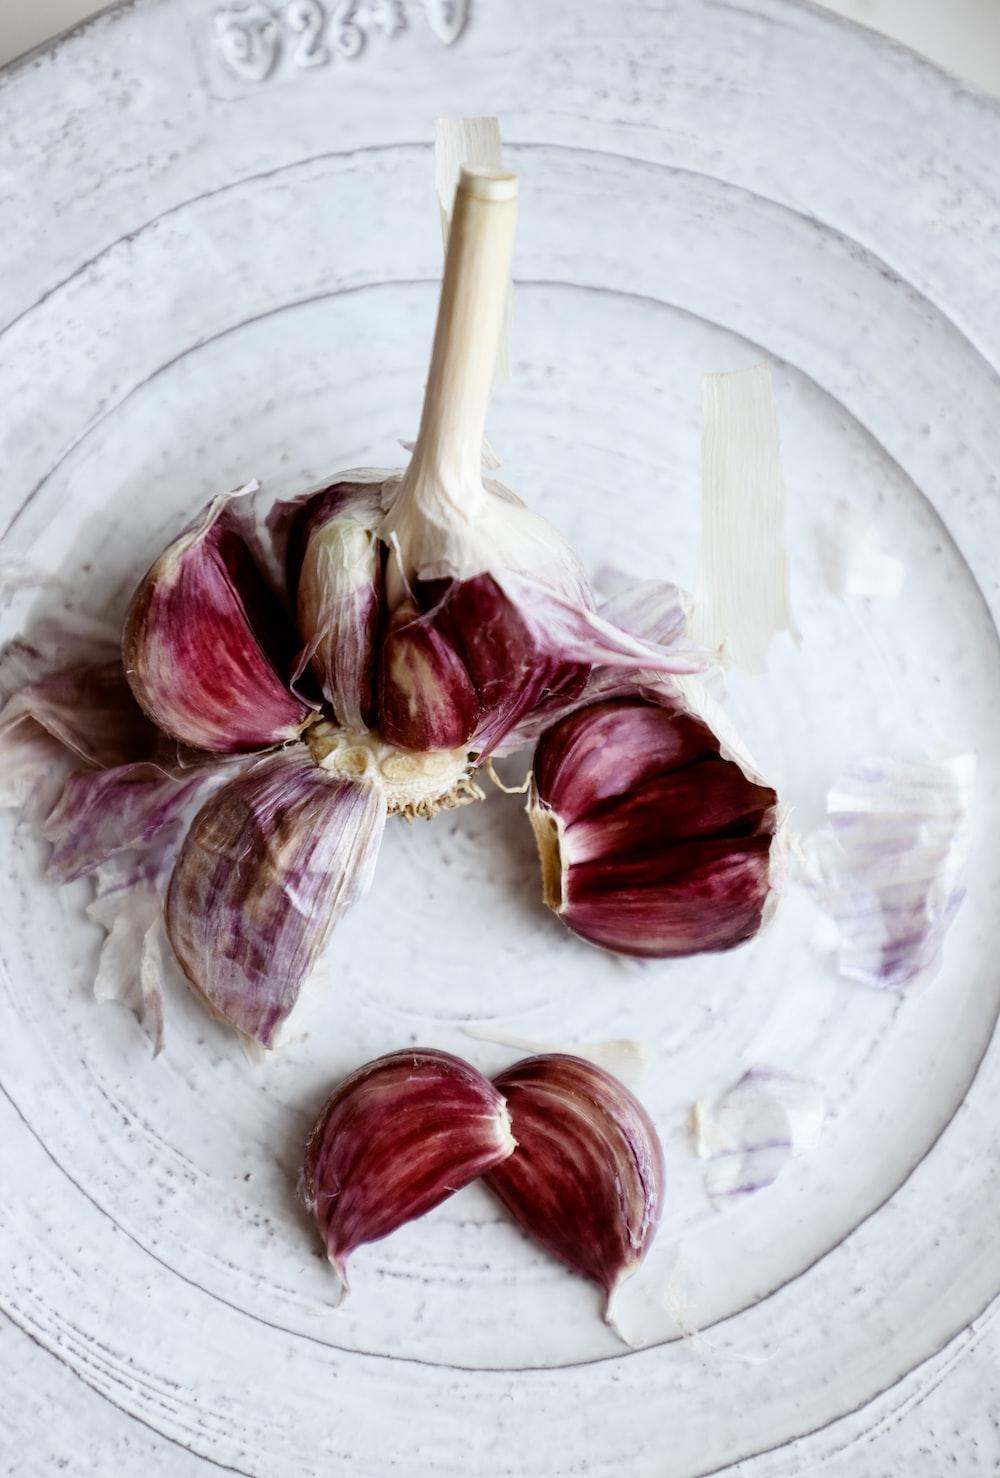 garlic on white plate